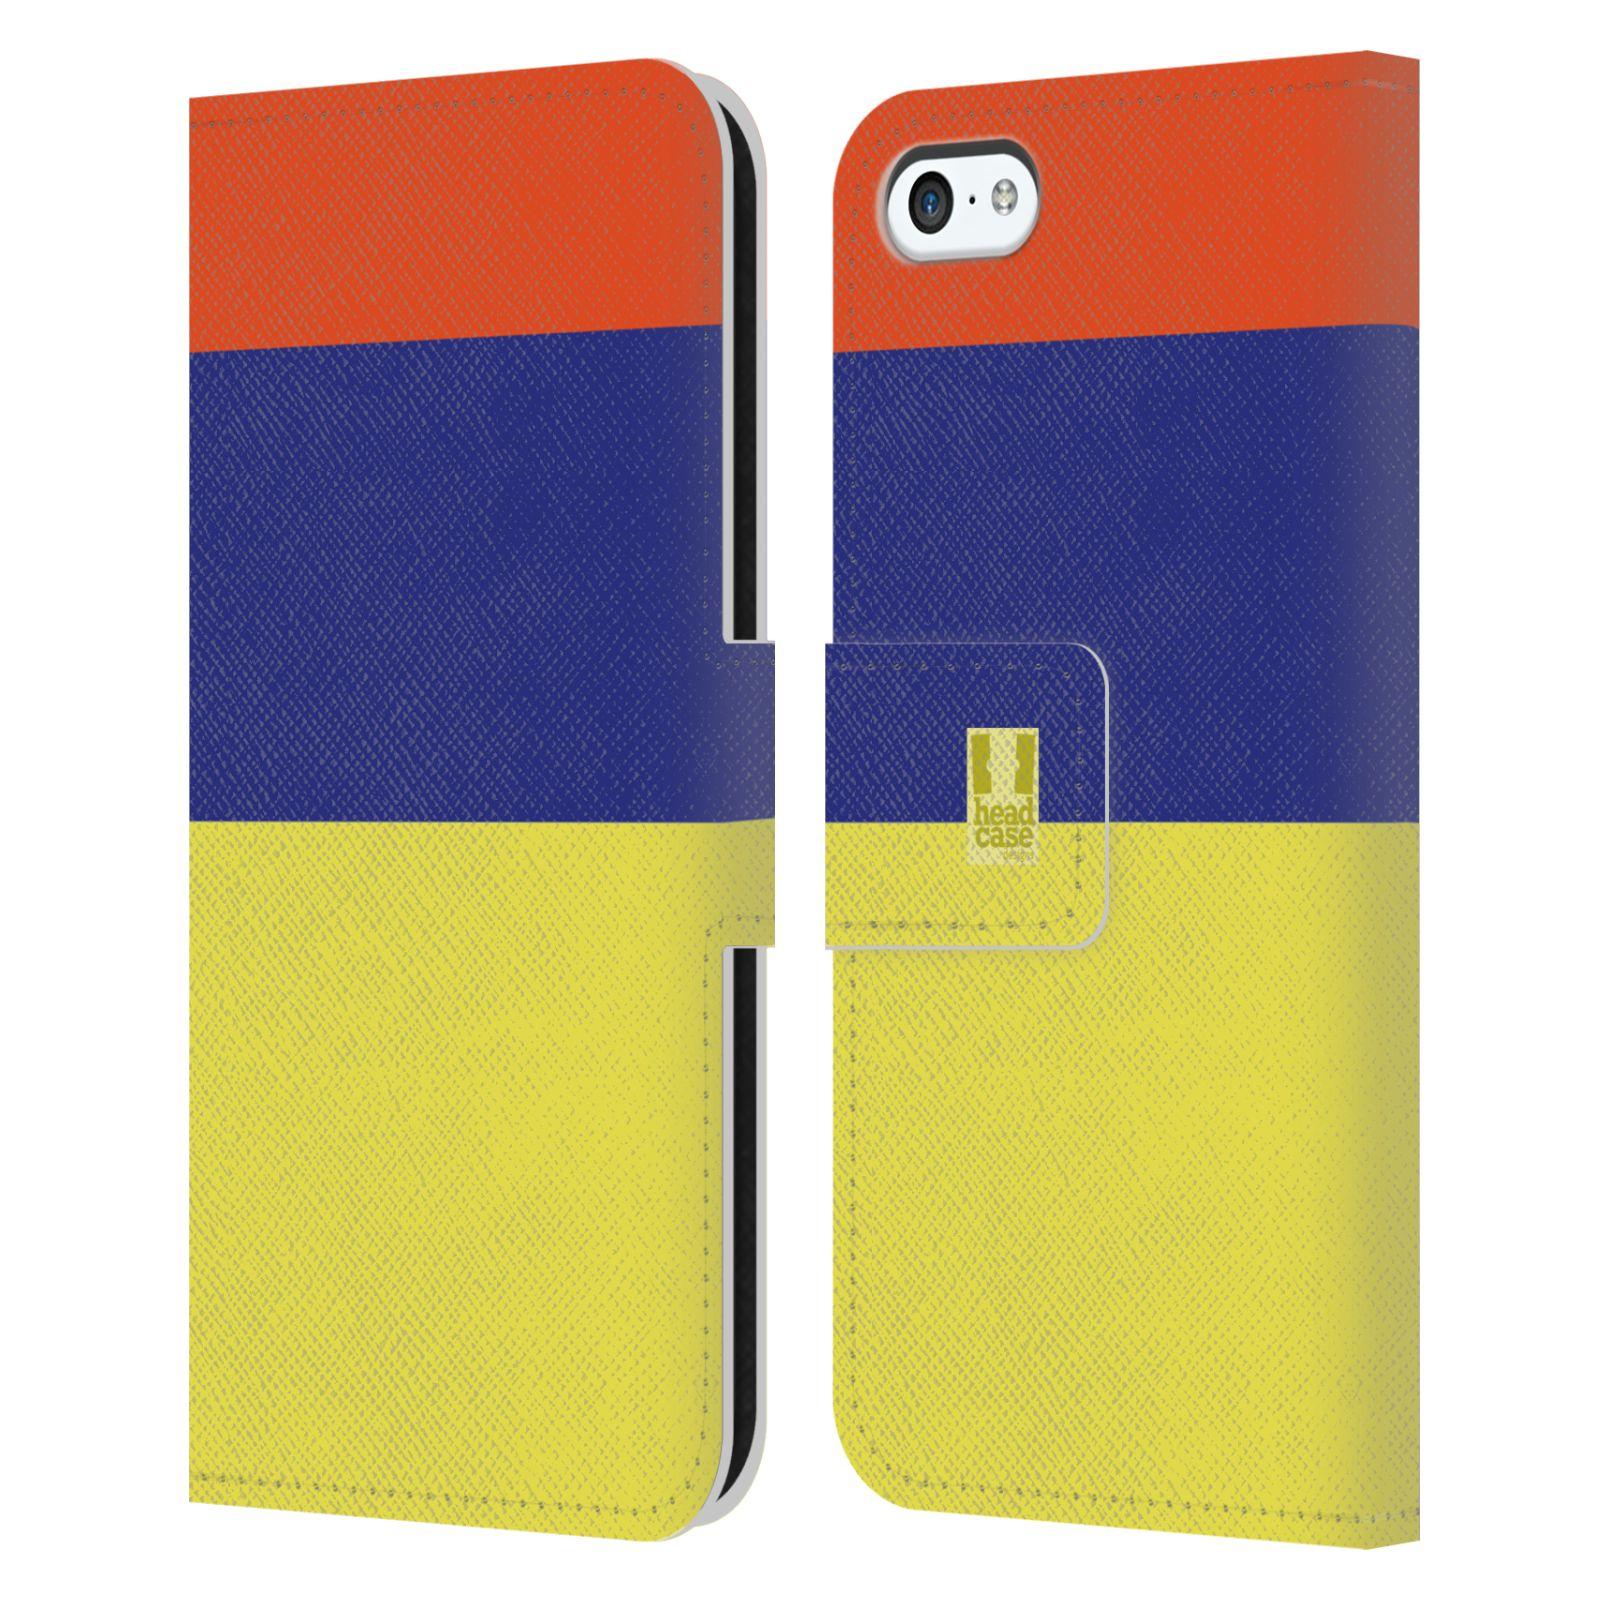 HEAD CASE Flipové pouzdro pro mobil Apple Iphone 5C barevné tvary žlutá, modrá, červená